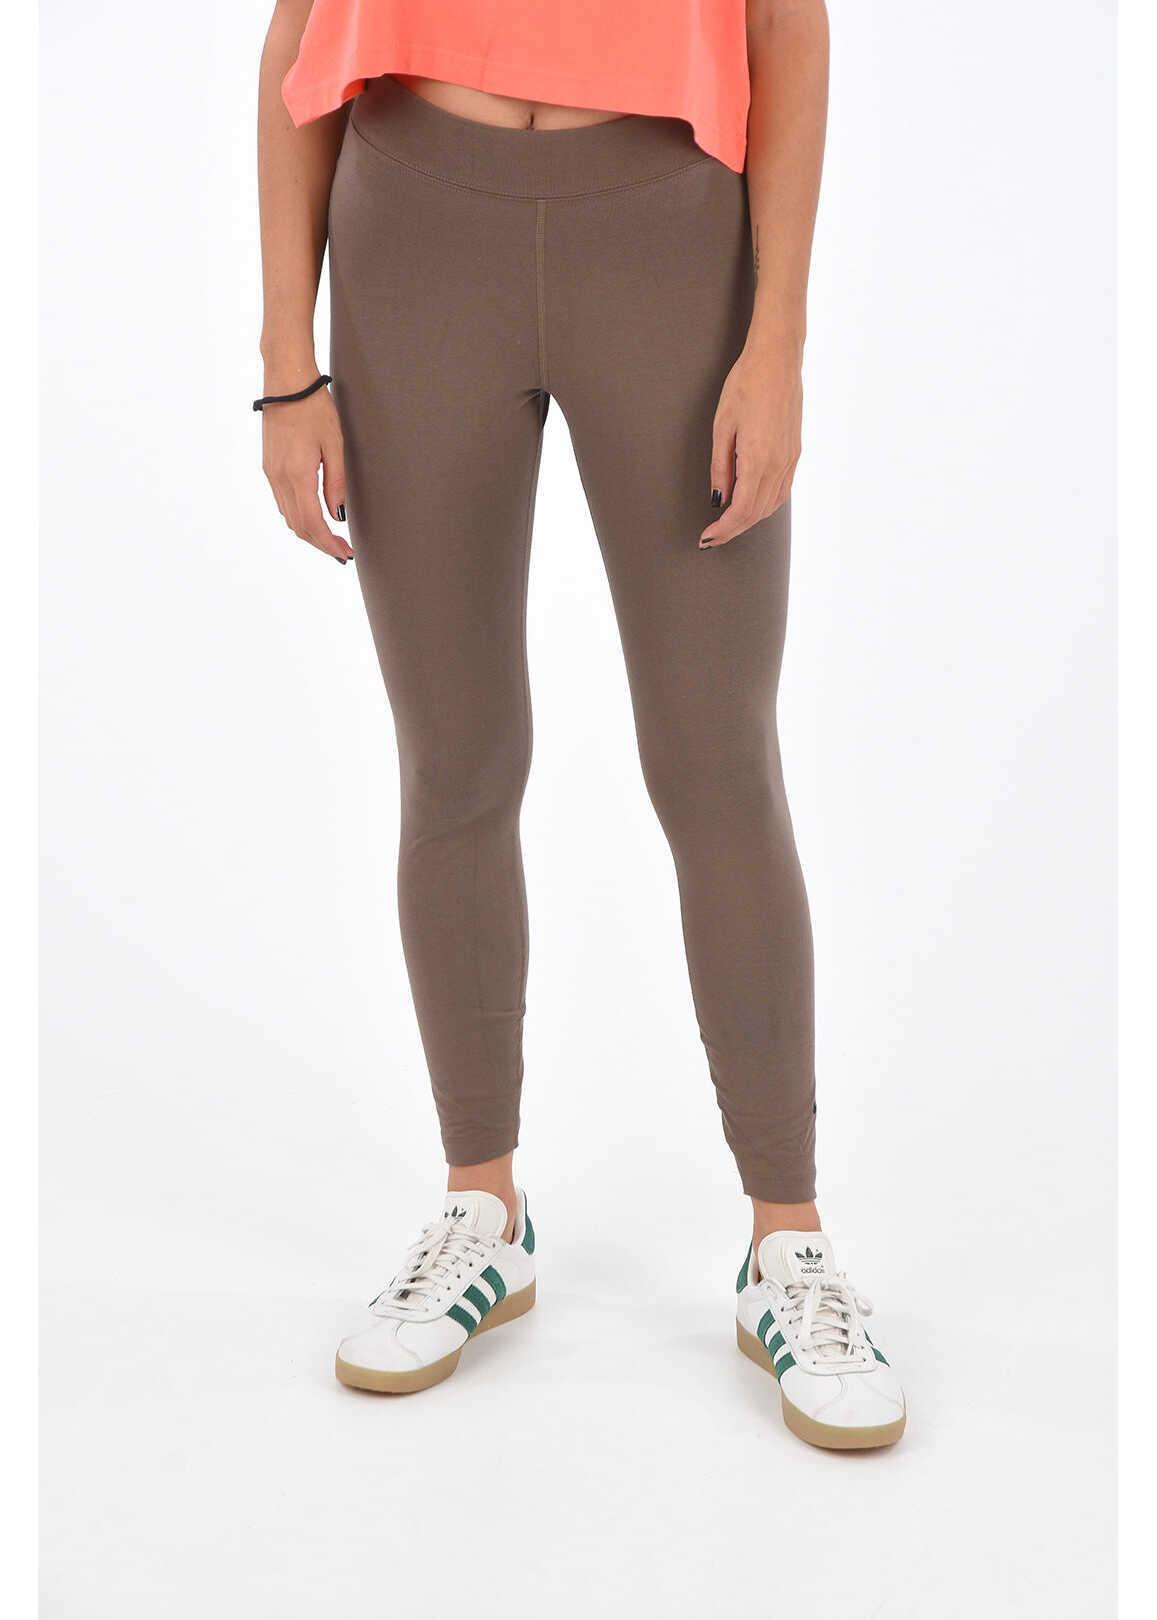 Nike Stretch Cotton Leggings Brown image0